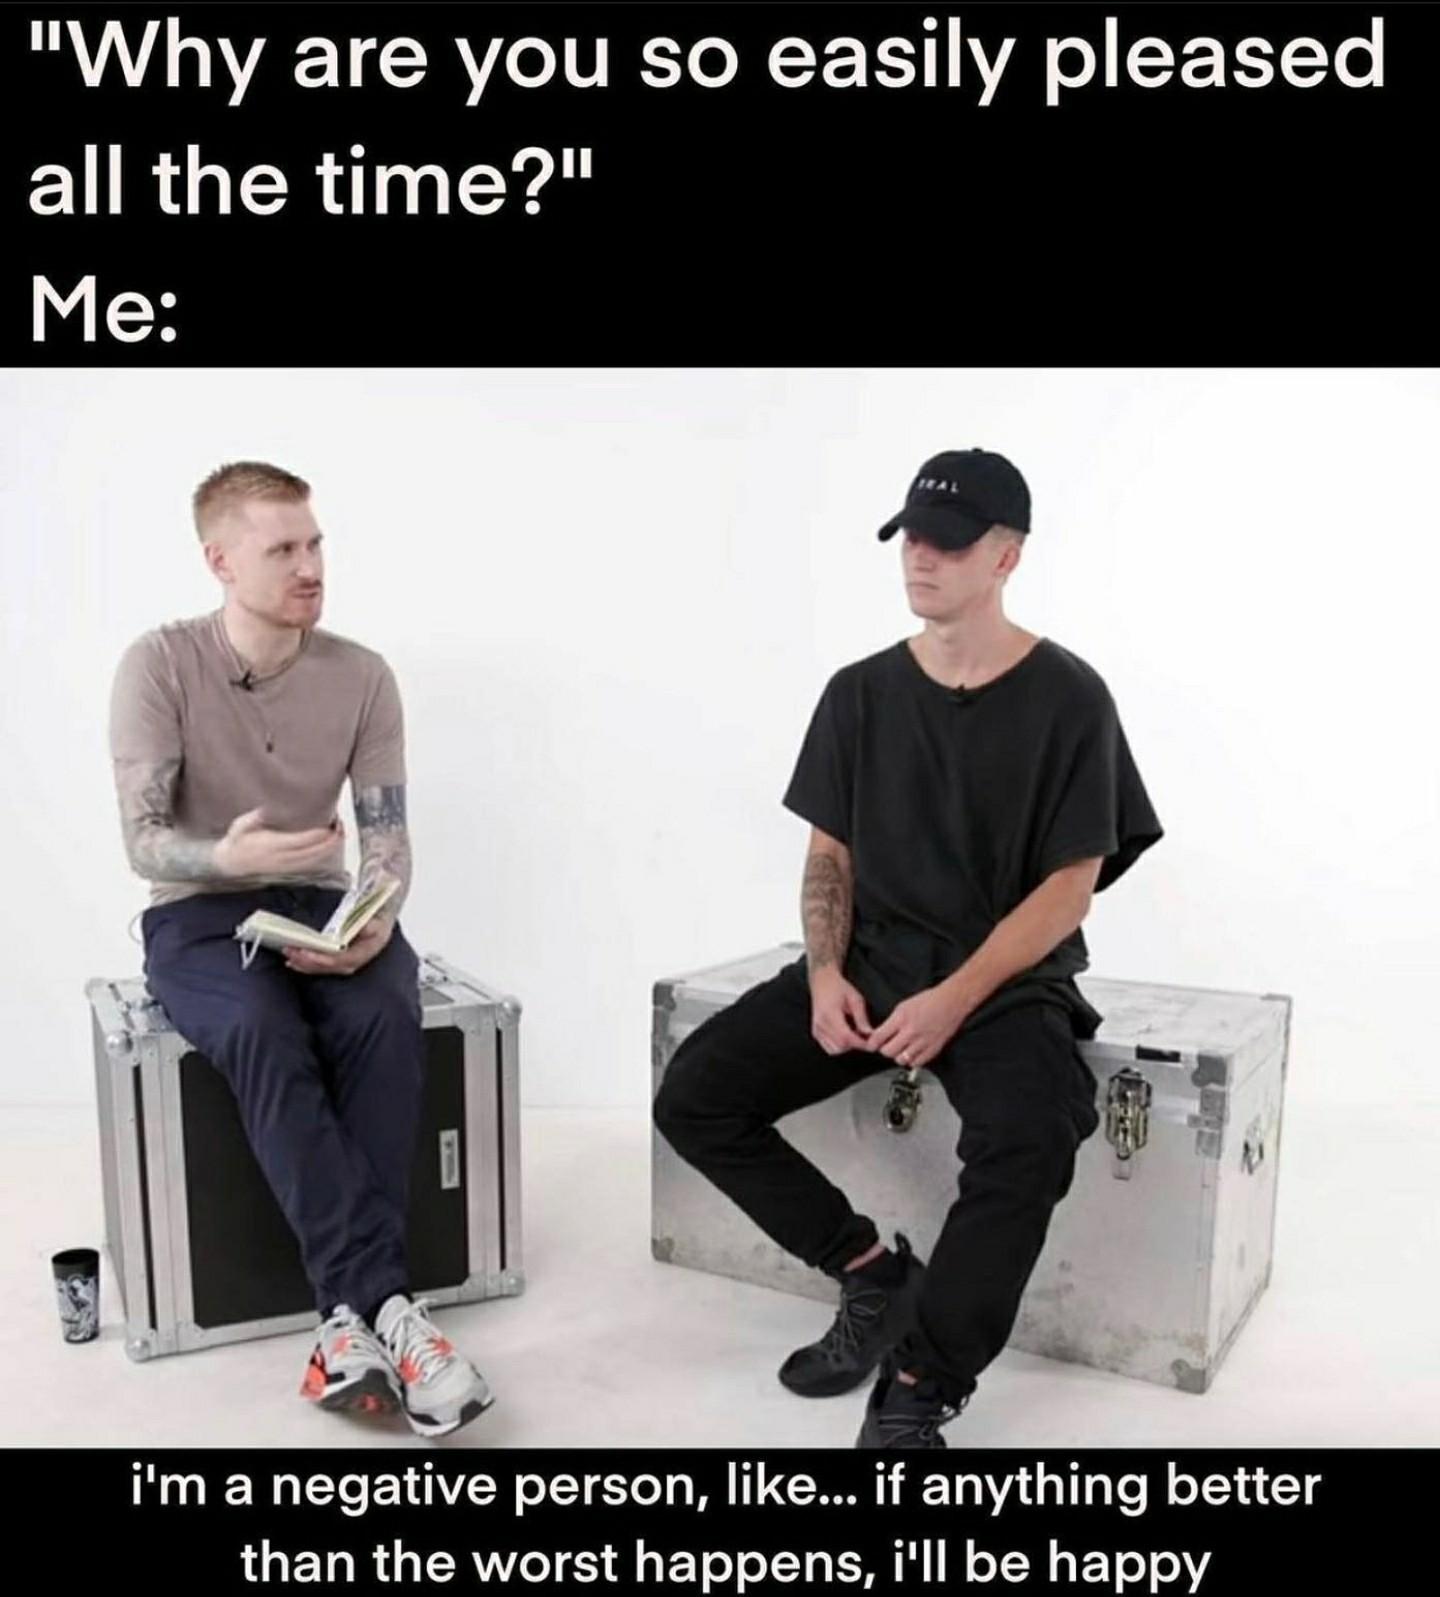 Same, bro - meme